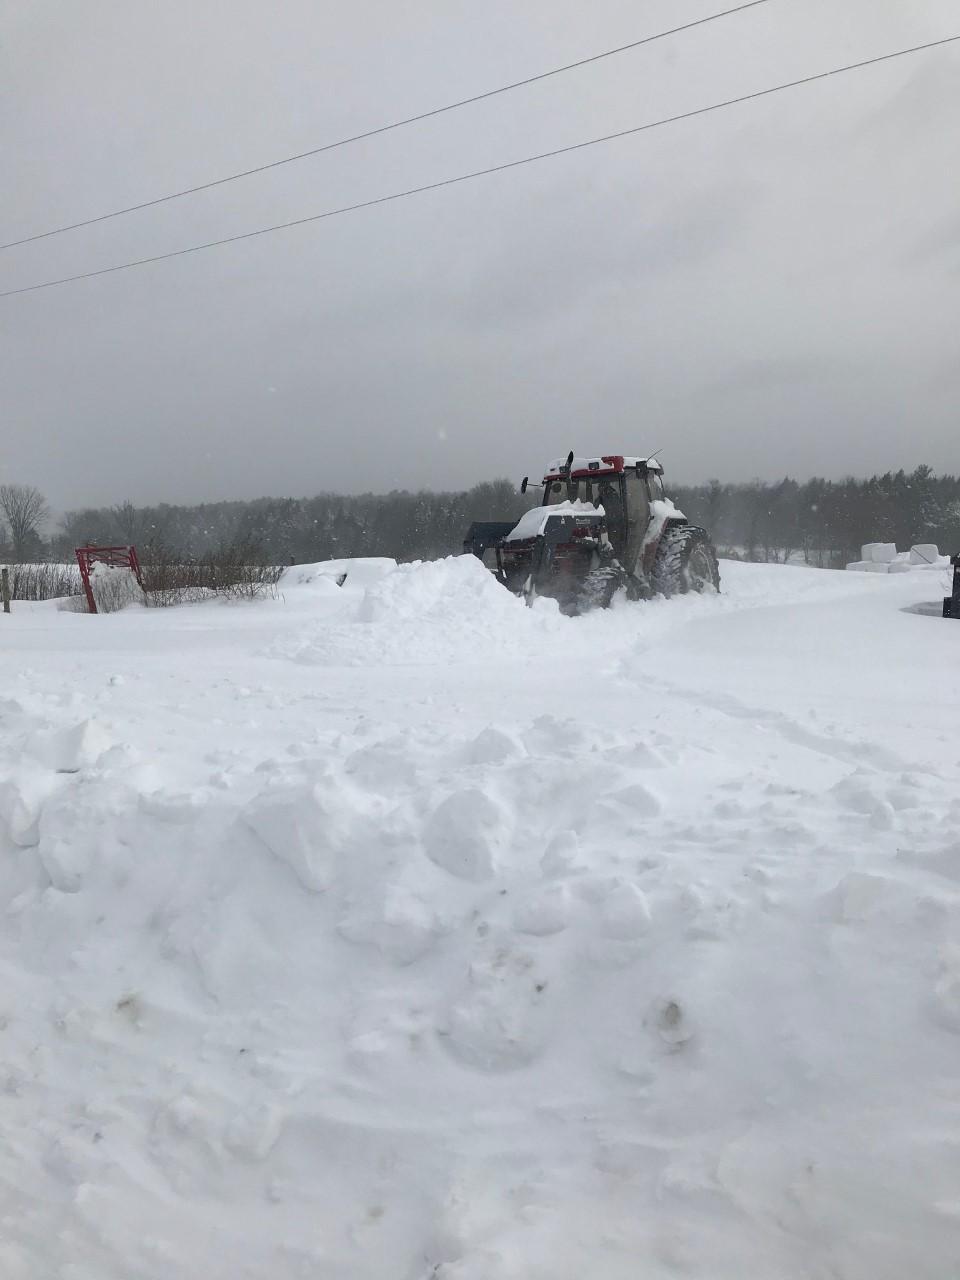 Snow storm December 17, 2020